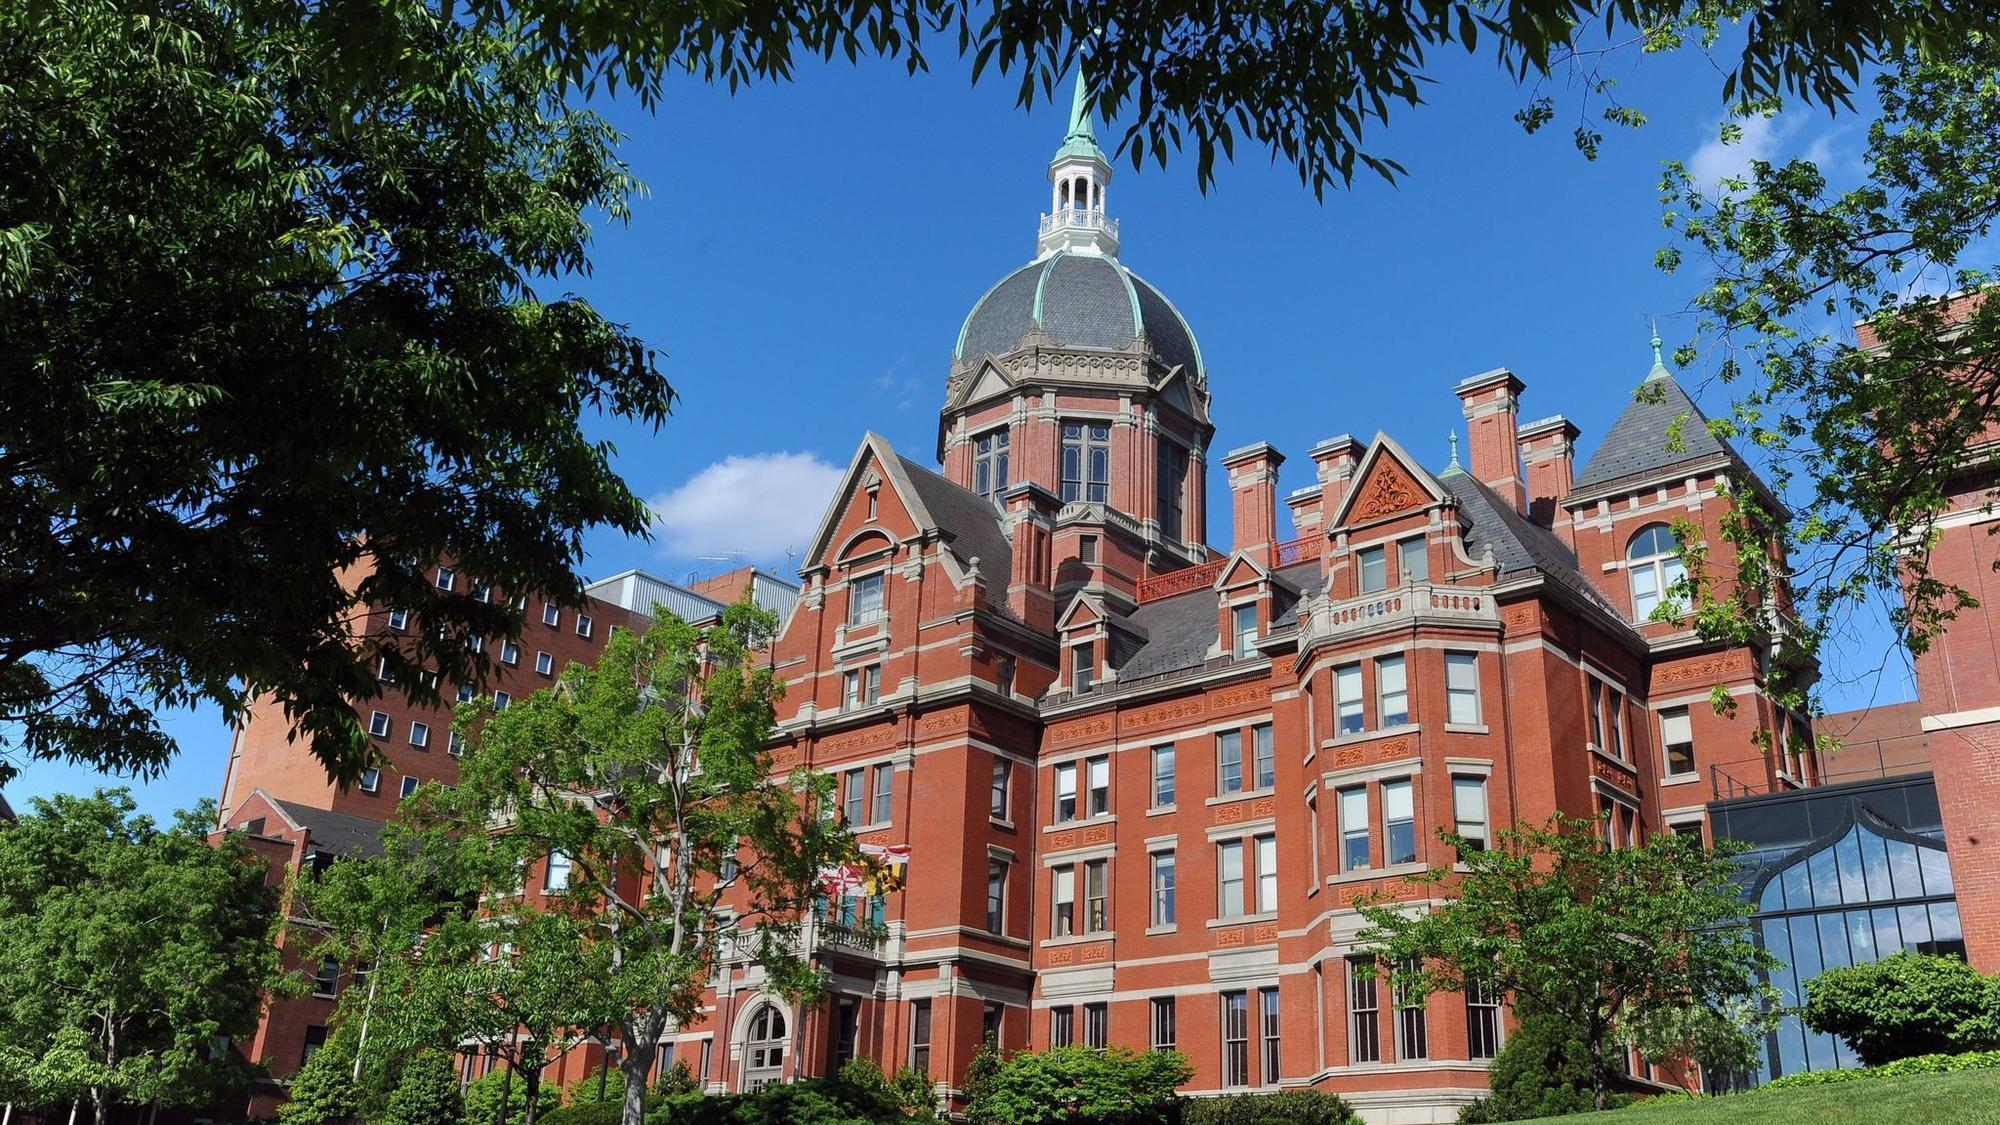 Cancer researcher first project under Deerfield, Hopkins partnership